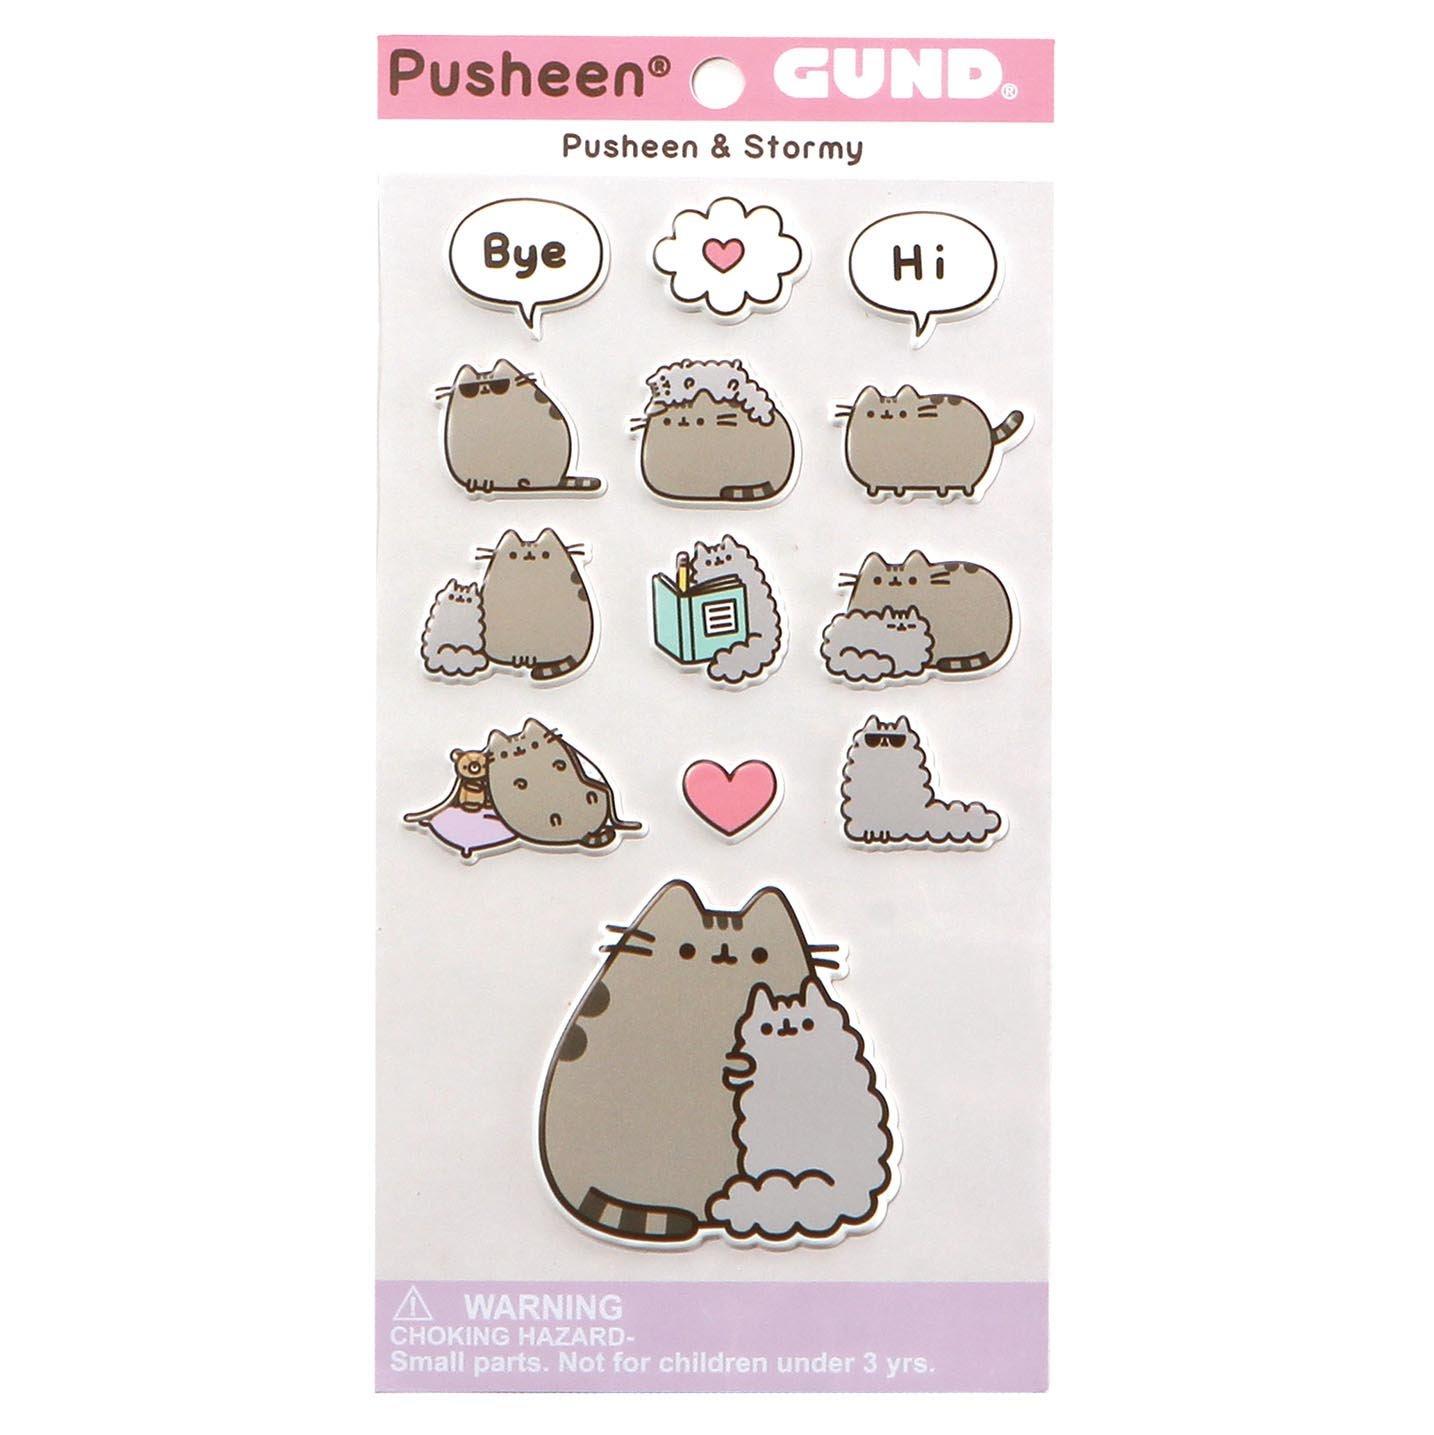 Gund Pusheen Stormy Sticker,, 9x18.5x13.00 cm (Enesco 4060833)